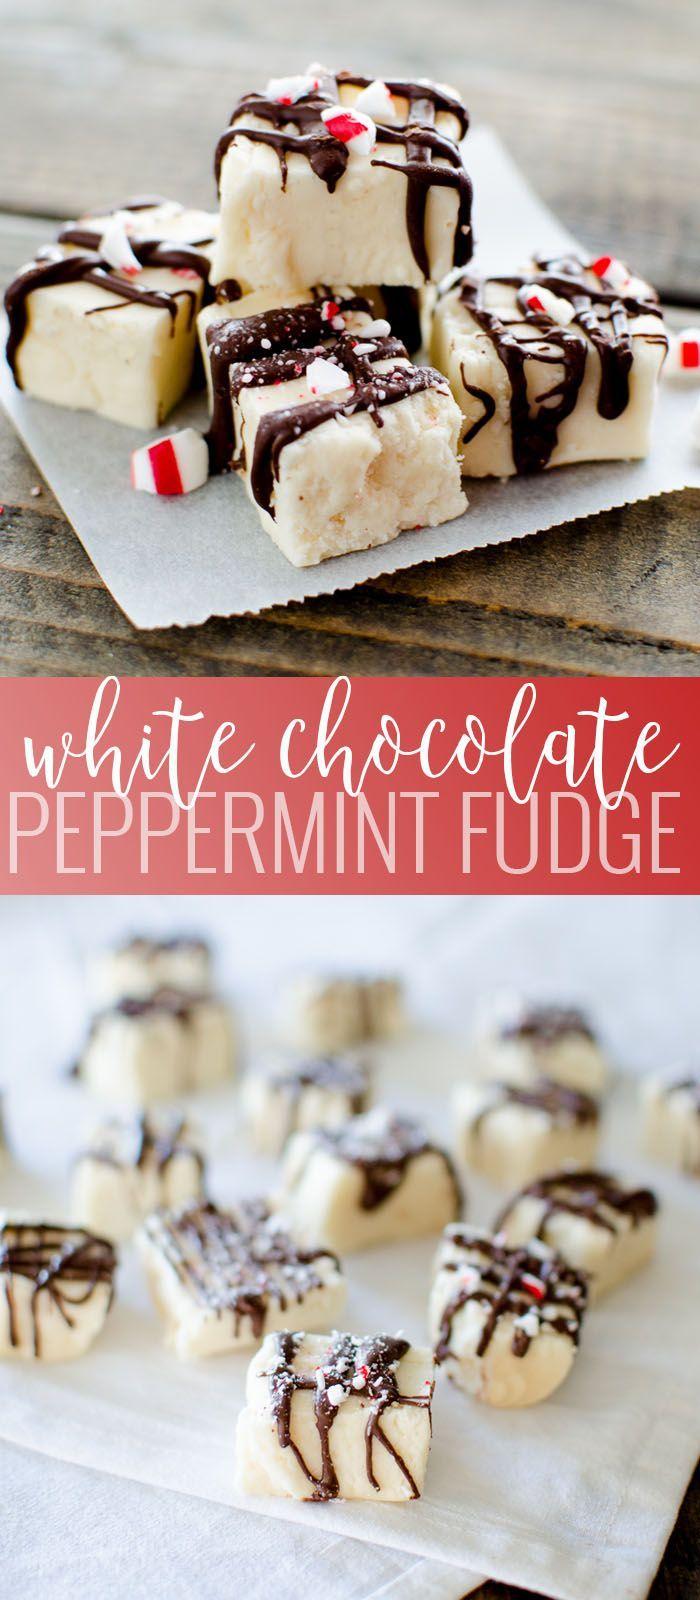 69 best Candy Recipes images on Pinterest | Desert recipes, Dessert ...